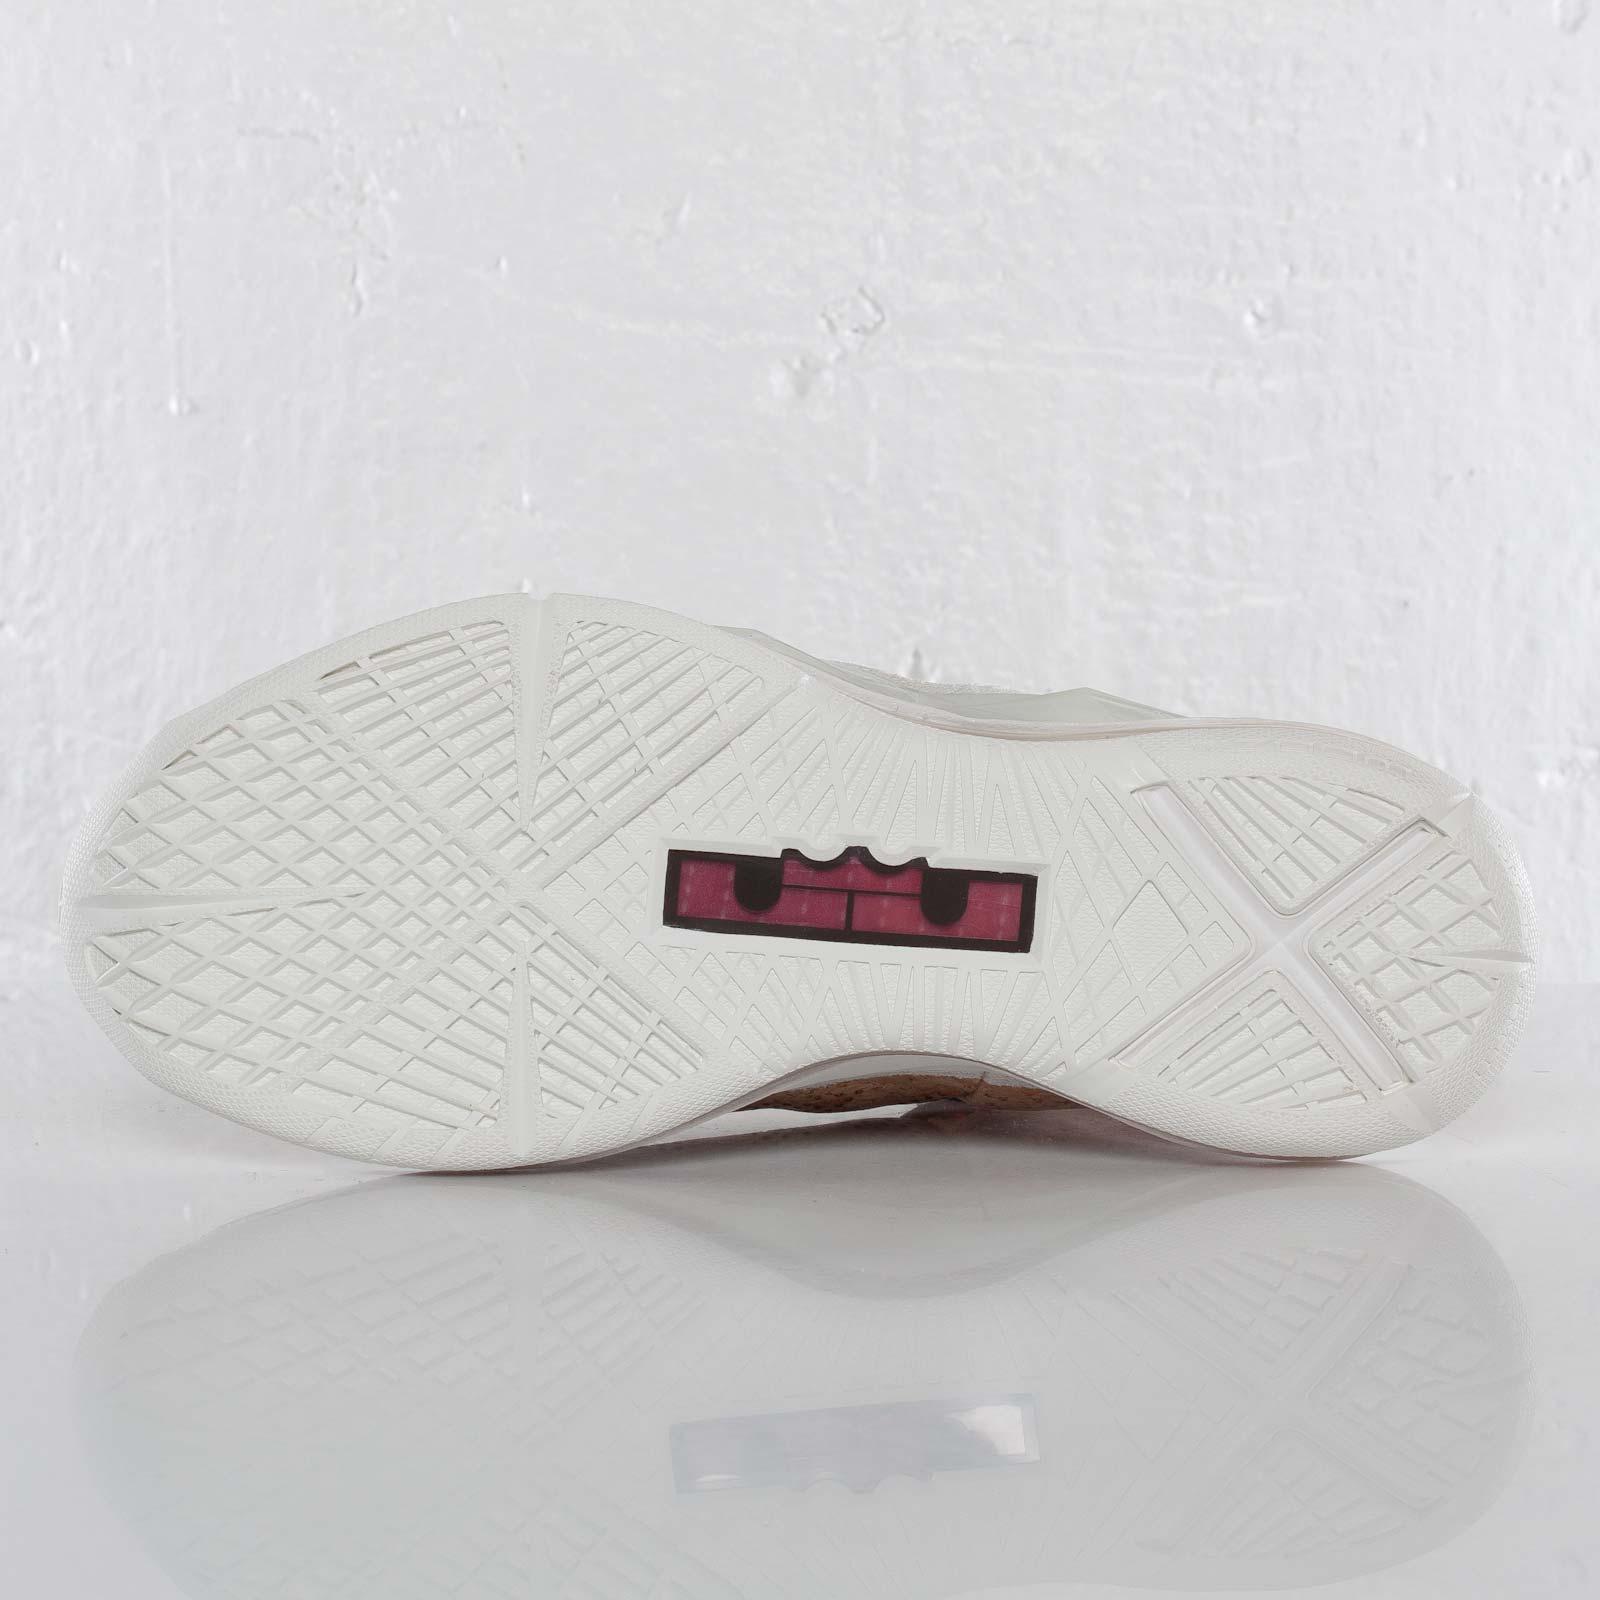 premium selection 81eba 6925a Nike Lebron X EXT Cork QS - 580890-200 - Sneakersnstuff   sneakers    streetwear online since 1999